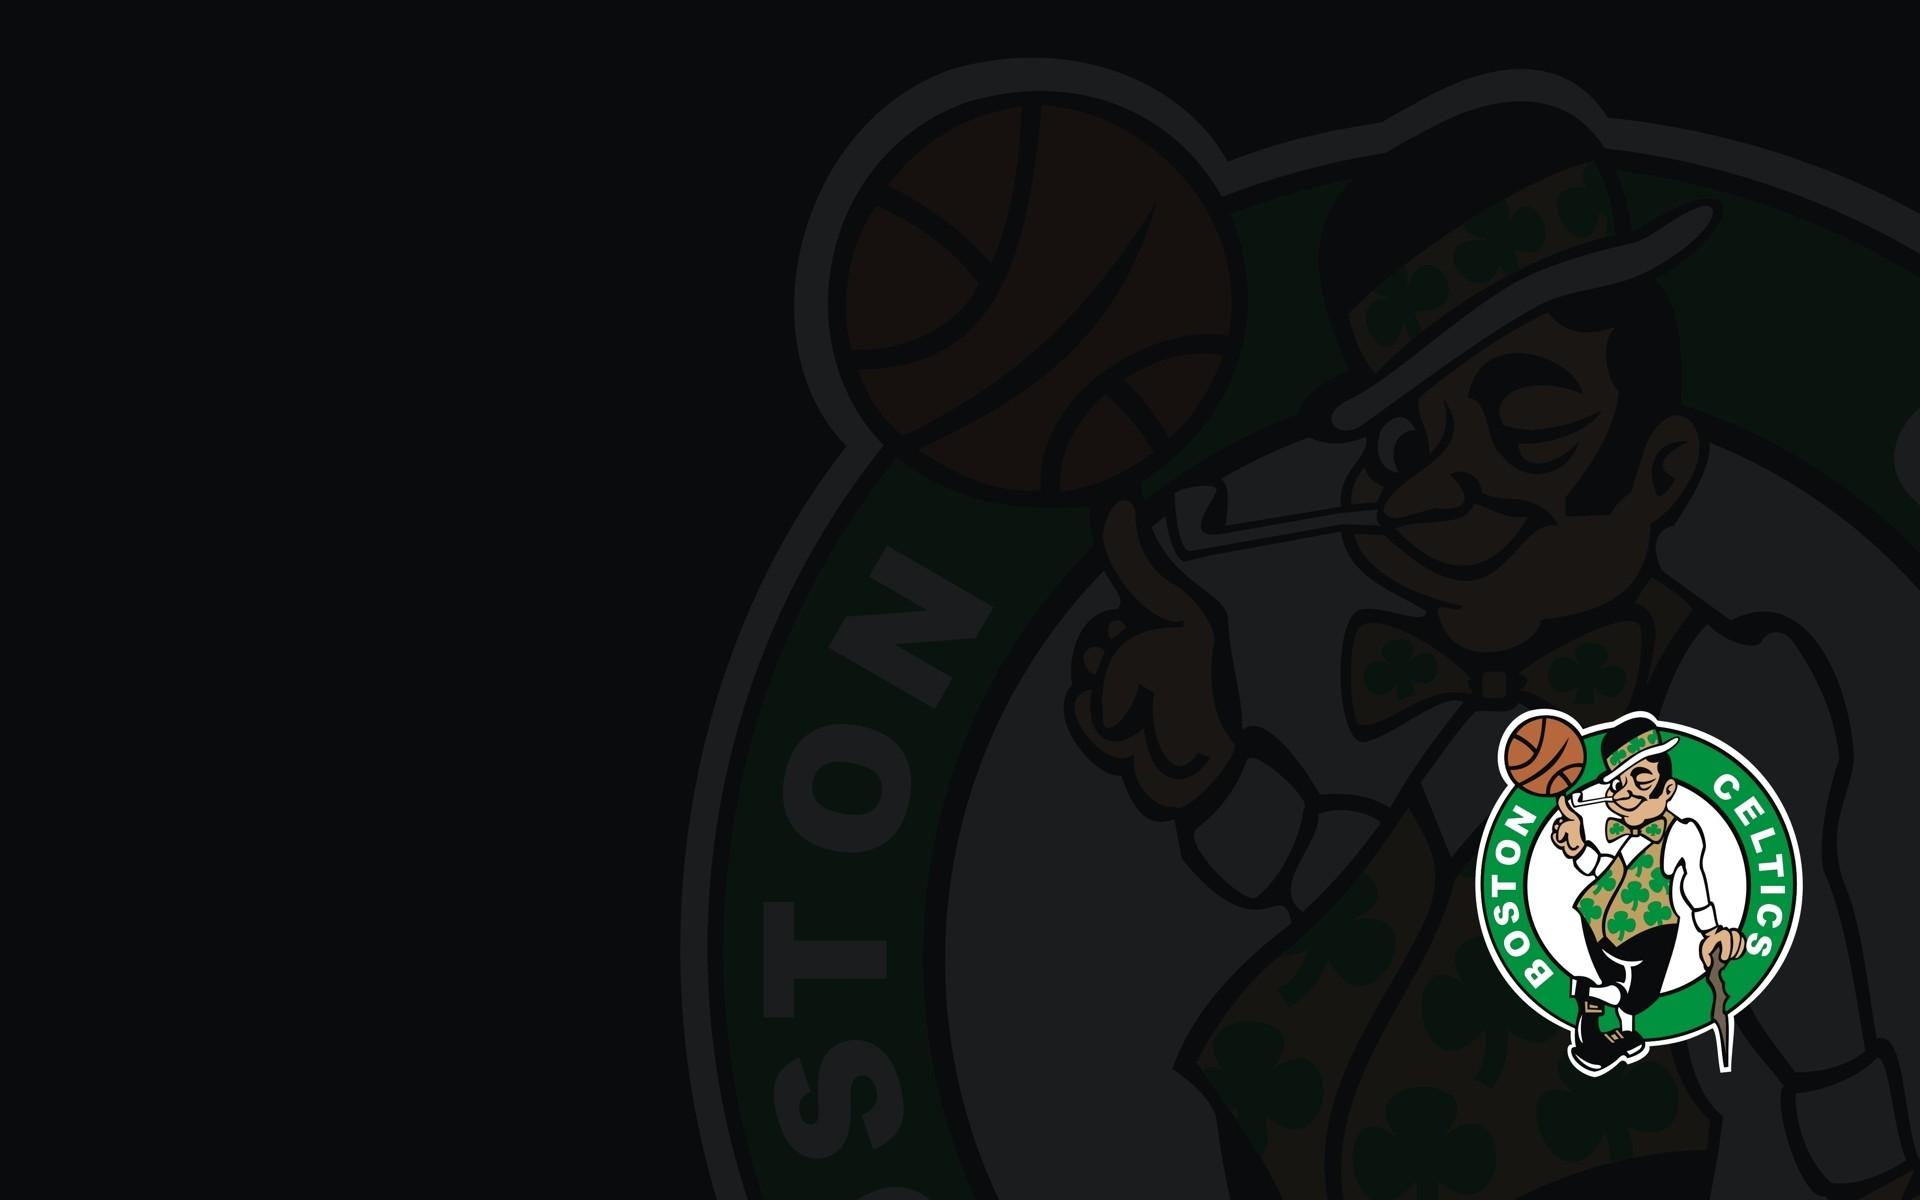 Boston Celtics Iphone Wallpaper 66 Images